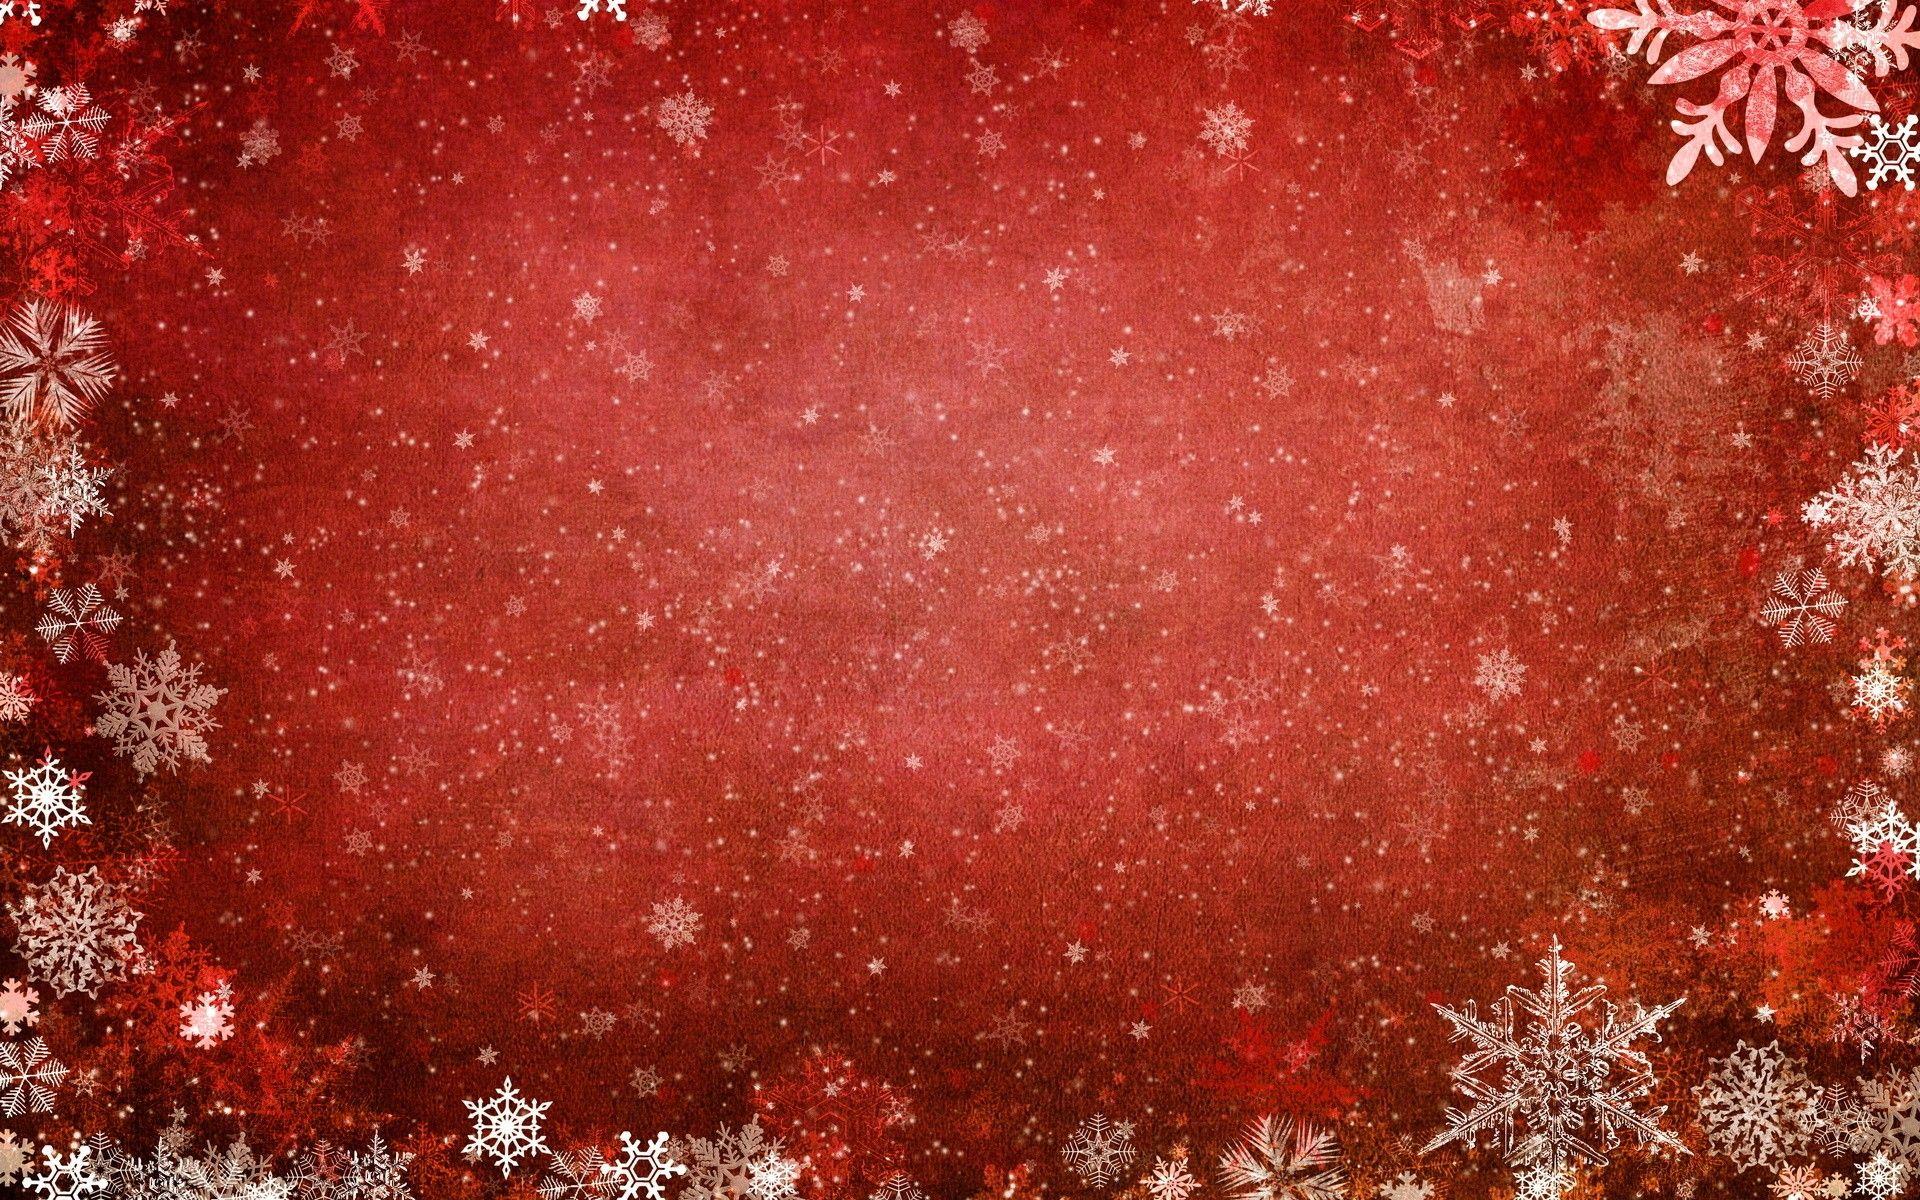 Fondos De Pantalla Navidenos: Fondos De Navidad Para Niños Para Pantalla Hd 2 HD